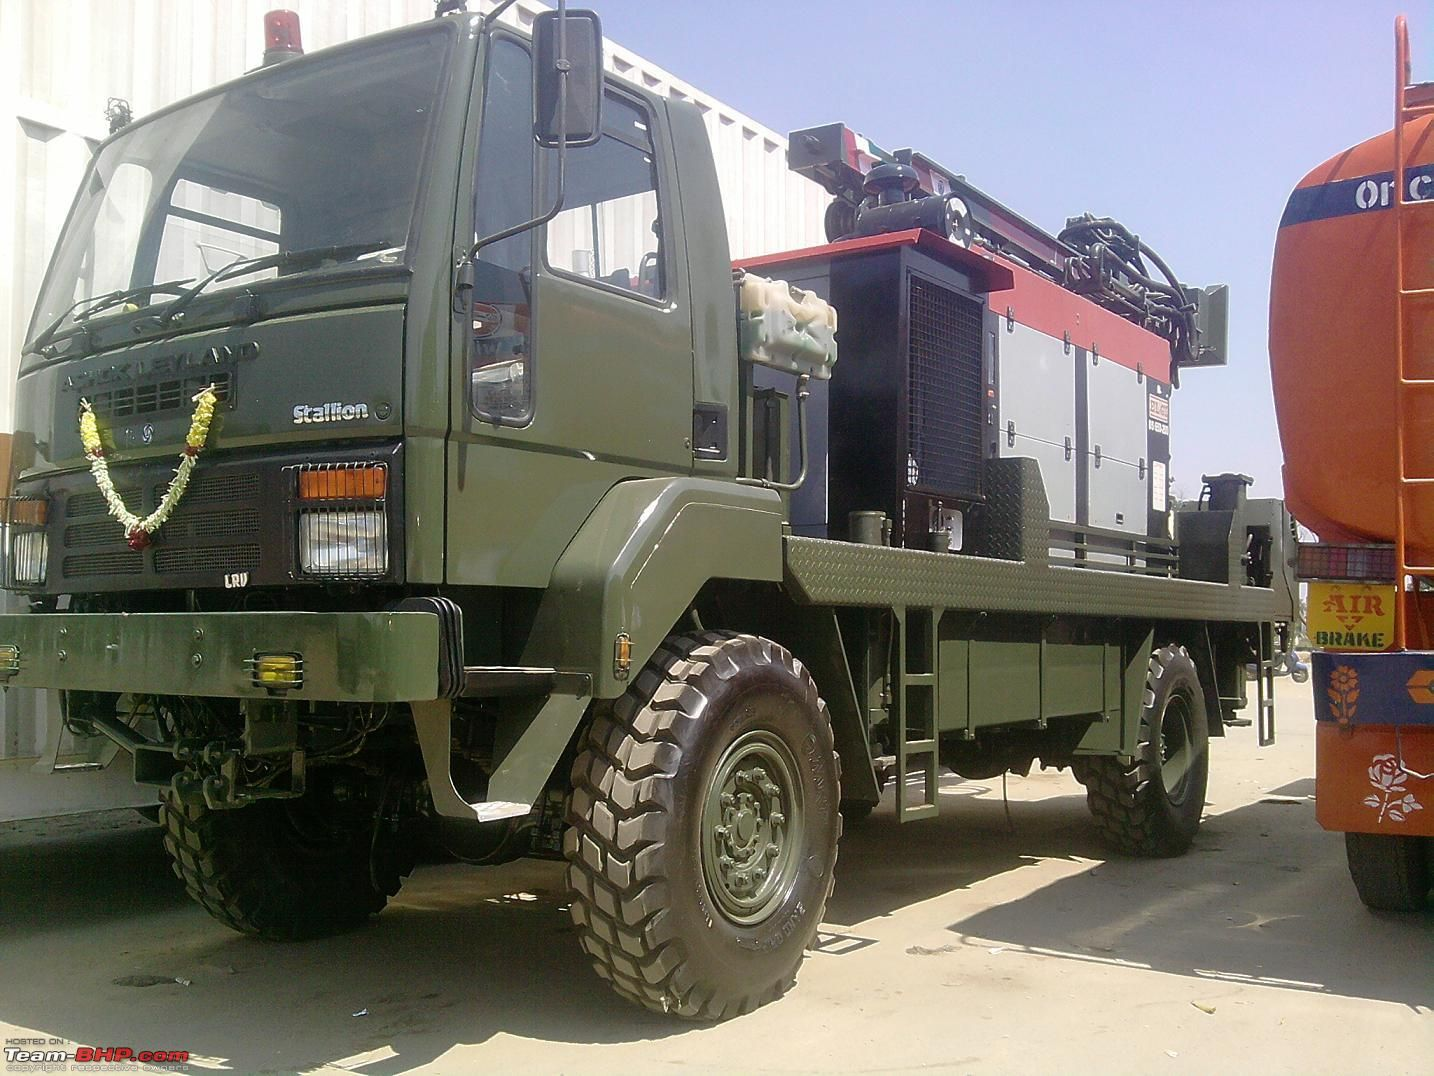 ASHOK LEYLAND STALLION Indian Army Army truck